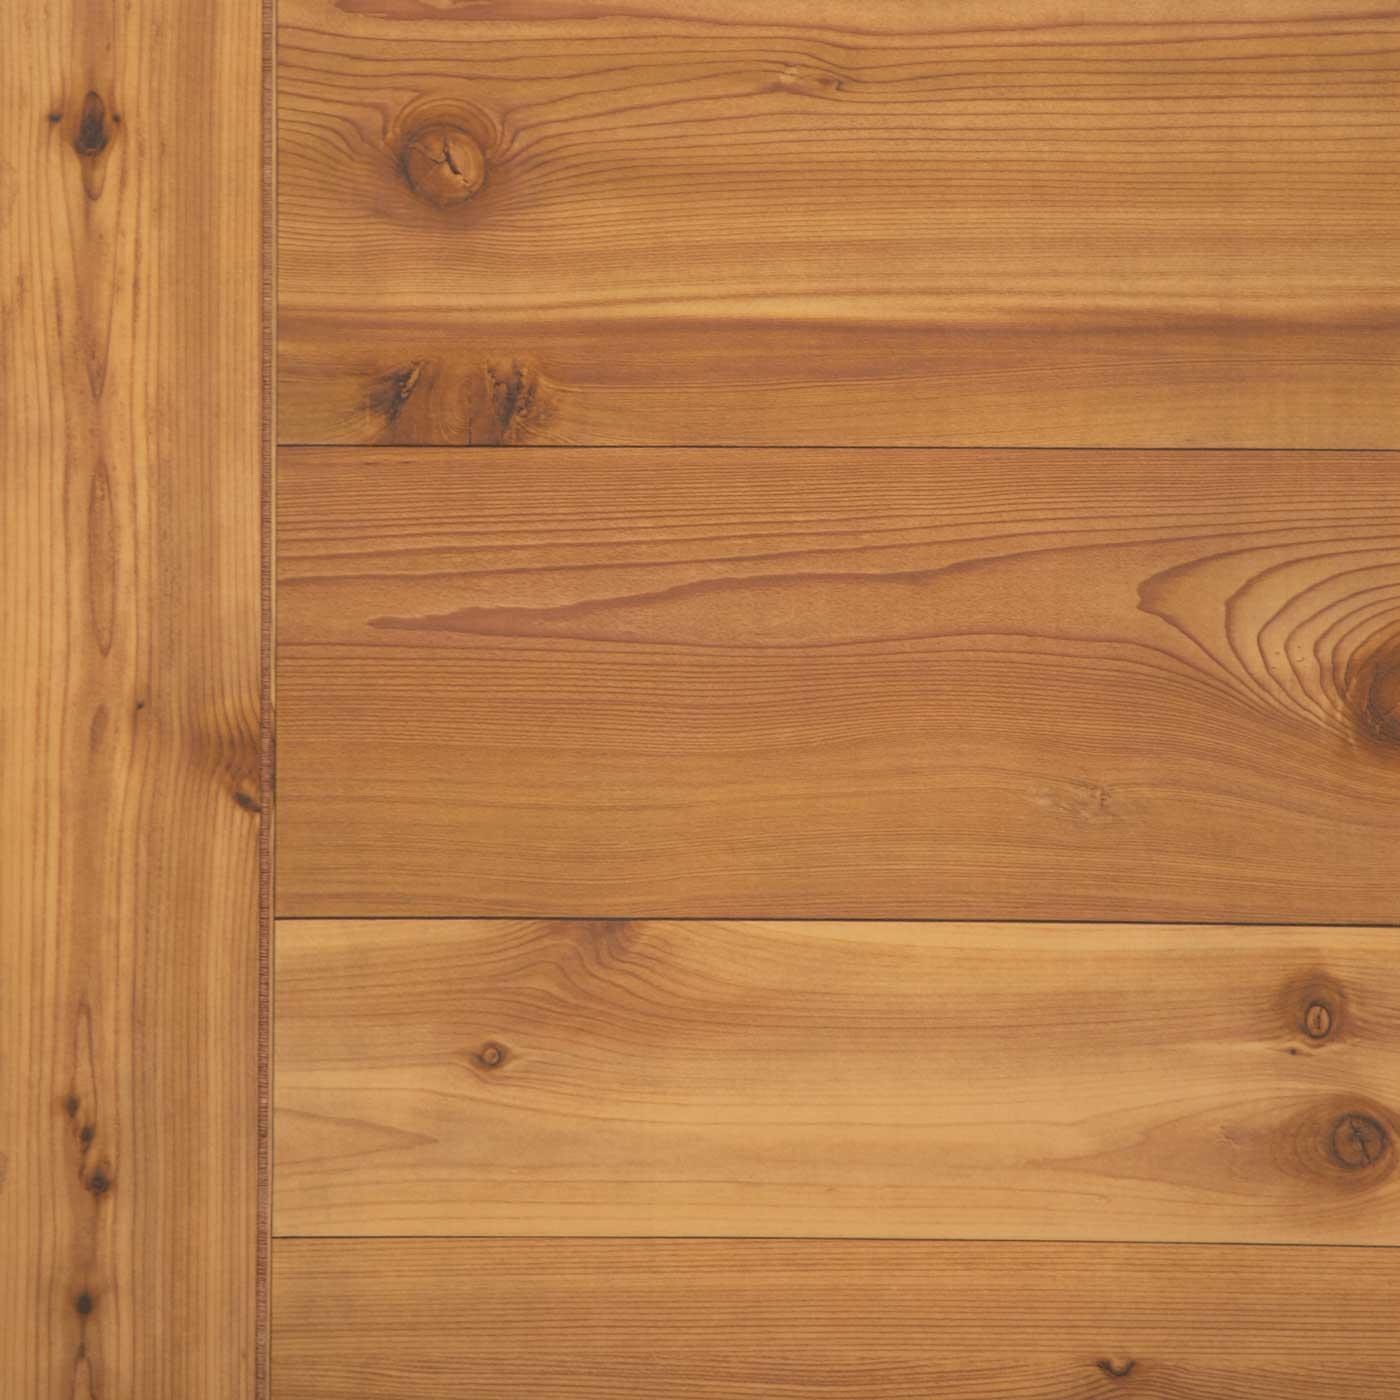 Wood Paneling Western Red Cedar Wall Paneling Plywood Panels